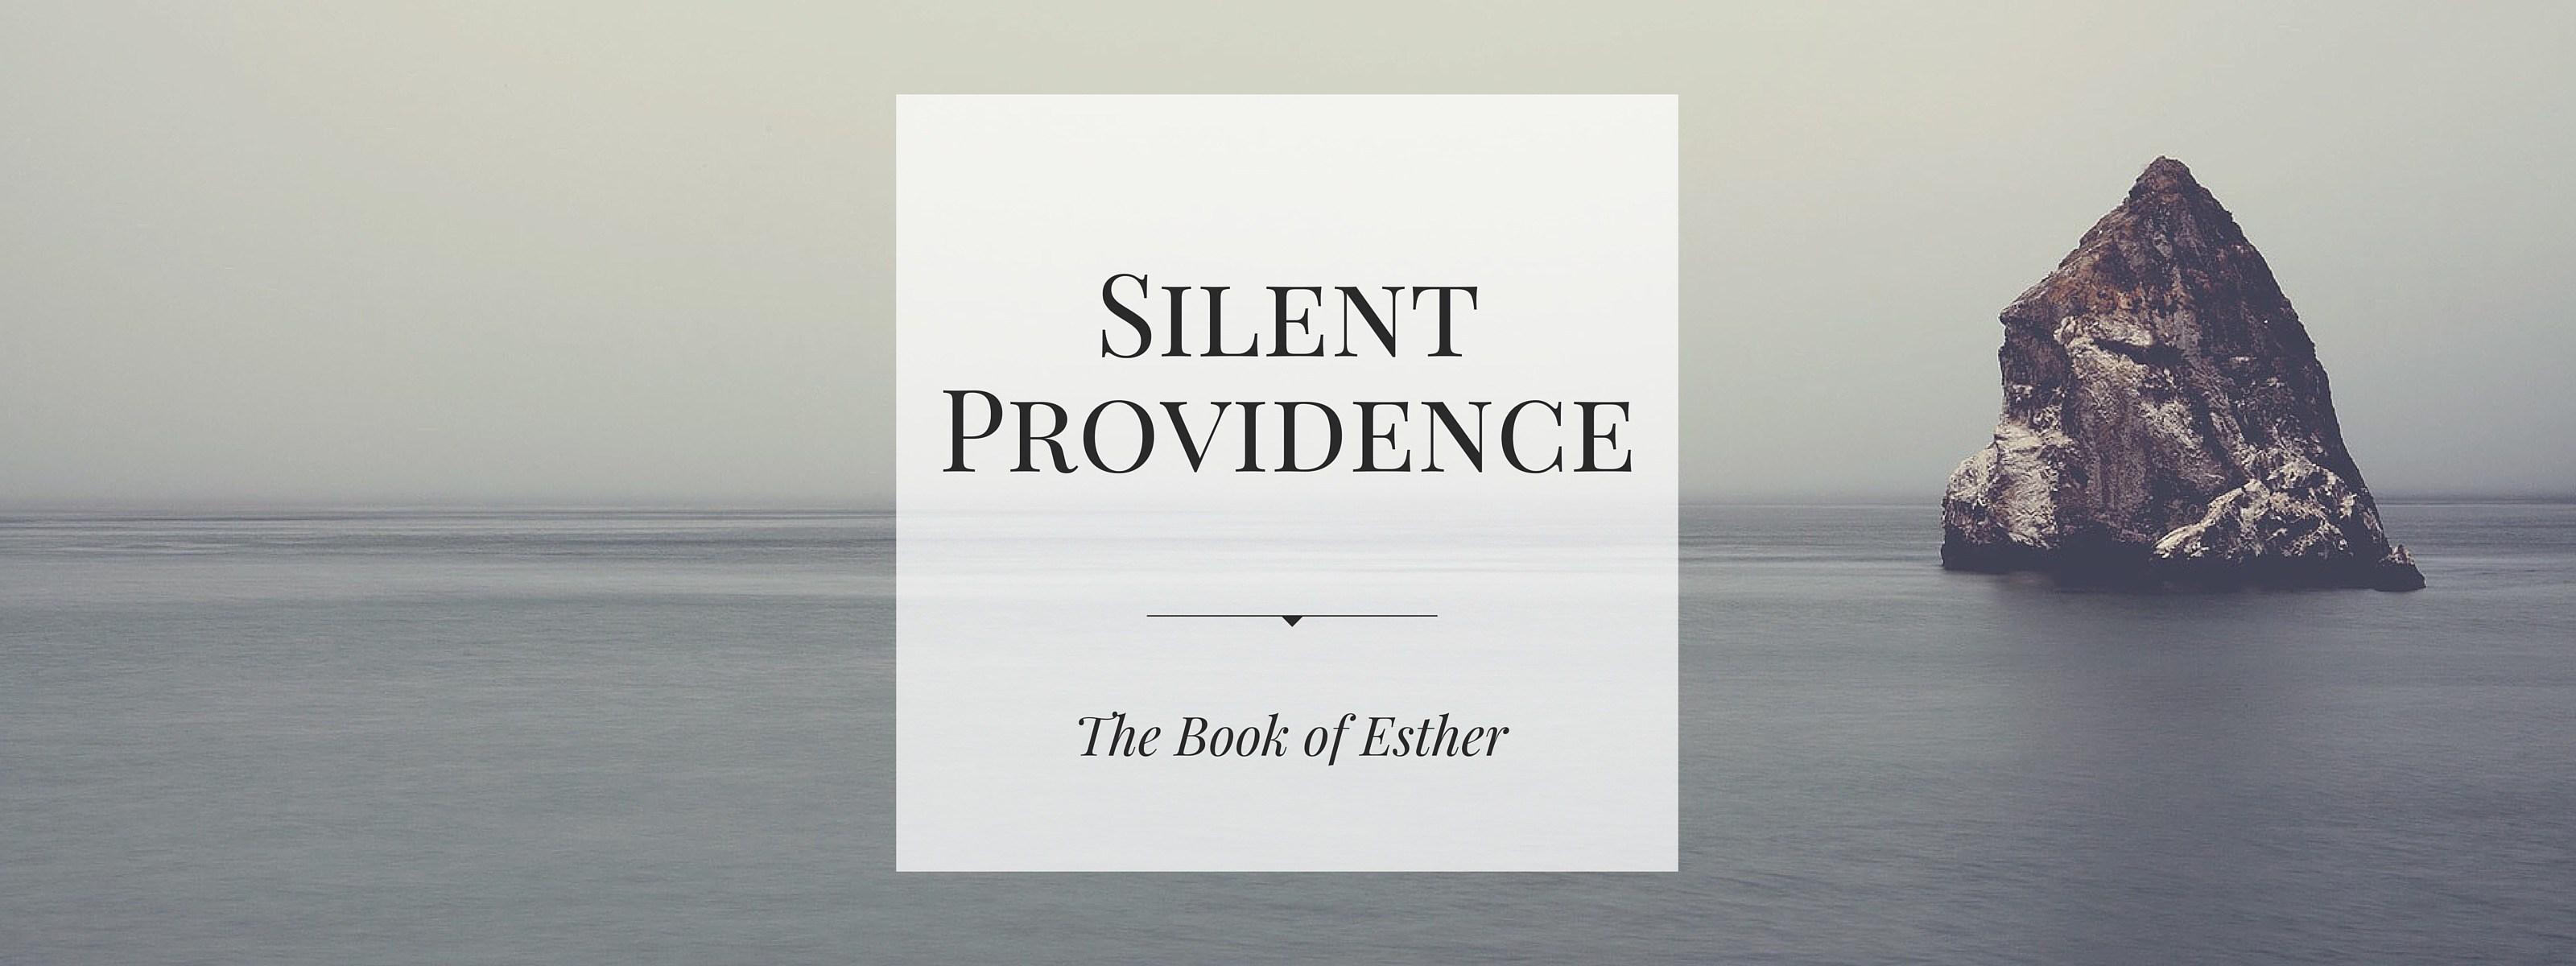 Silent Providence